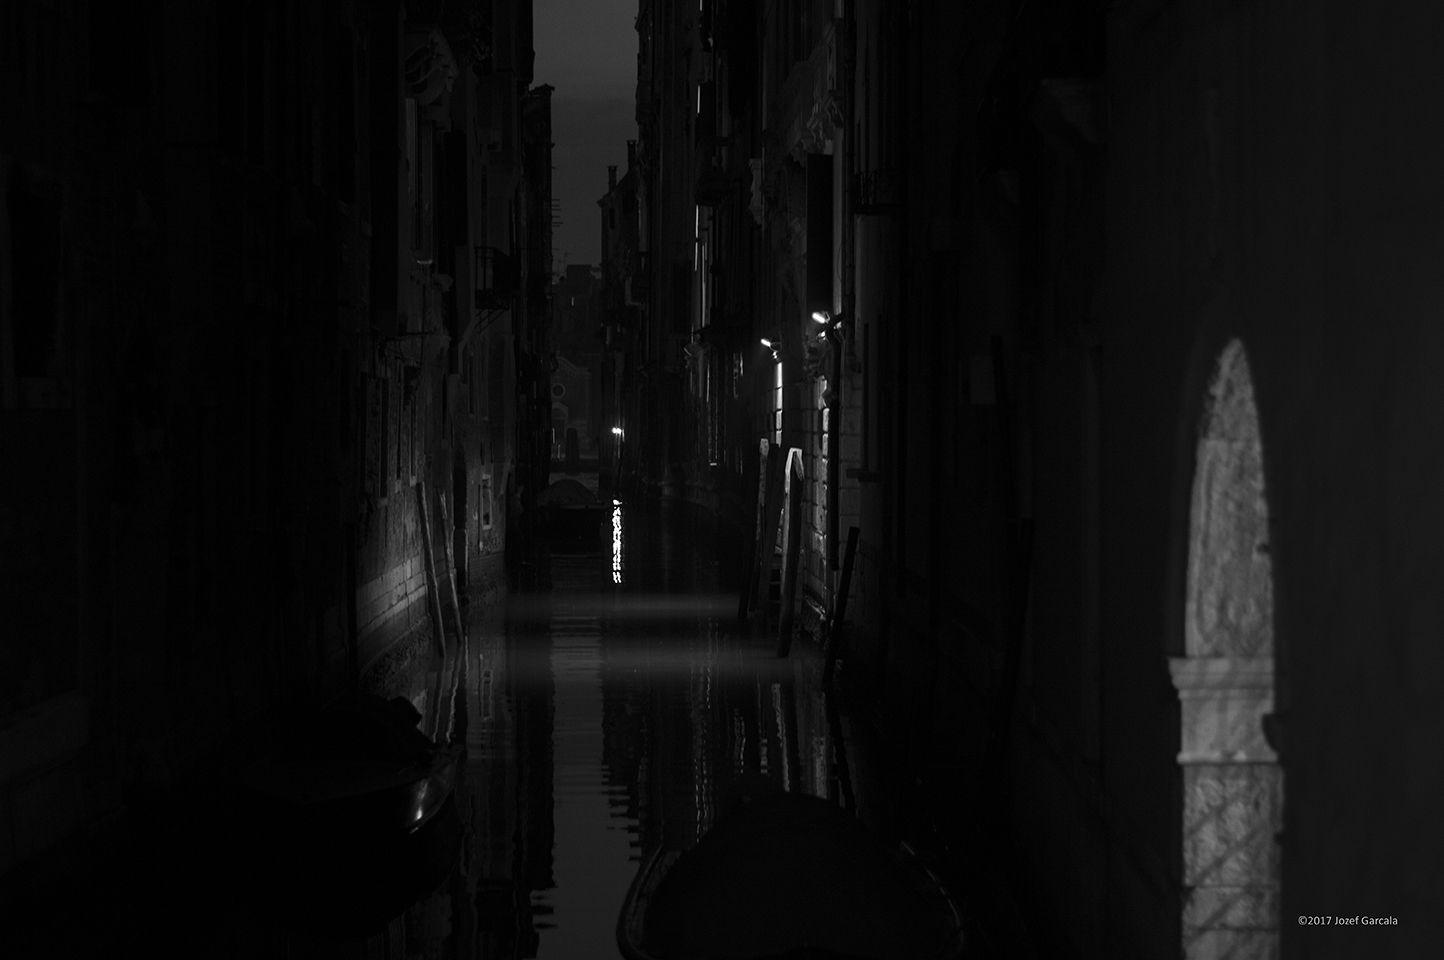 WPC: Venice at night